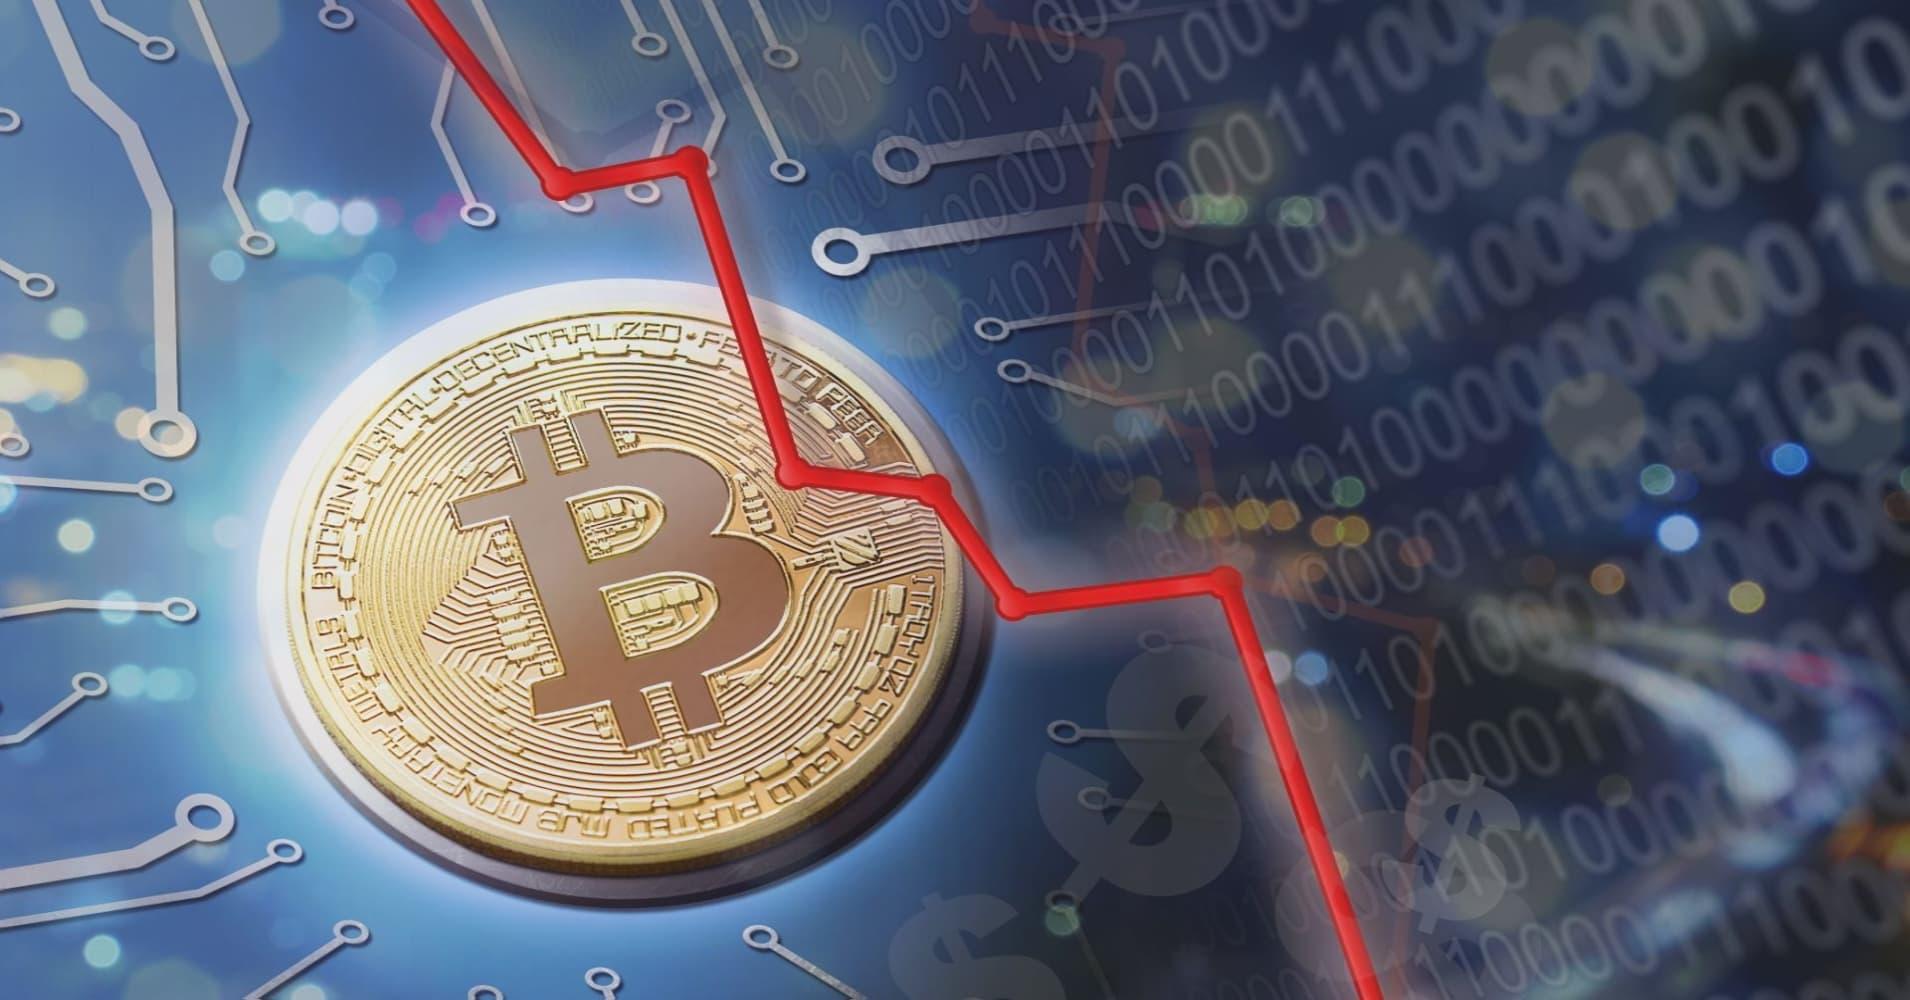 Bitcoin just fell below $10,000 - again